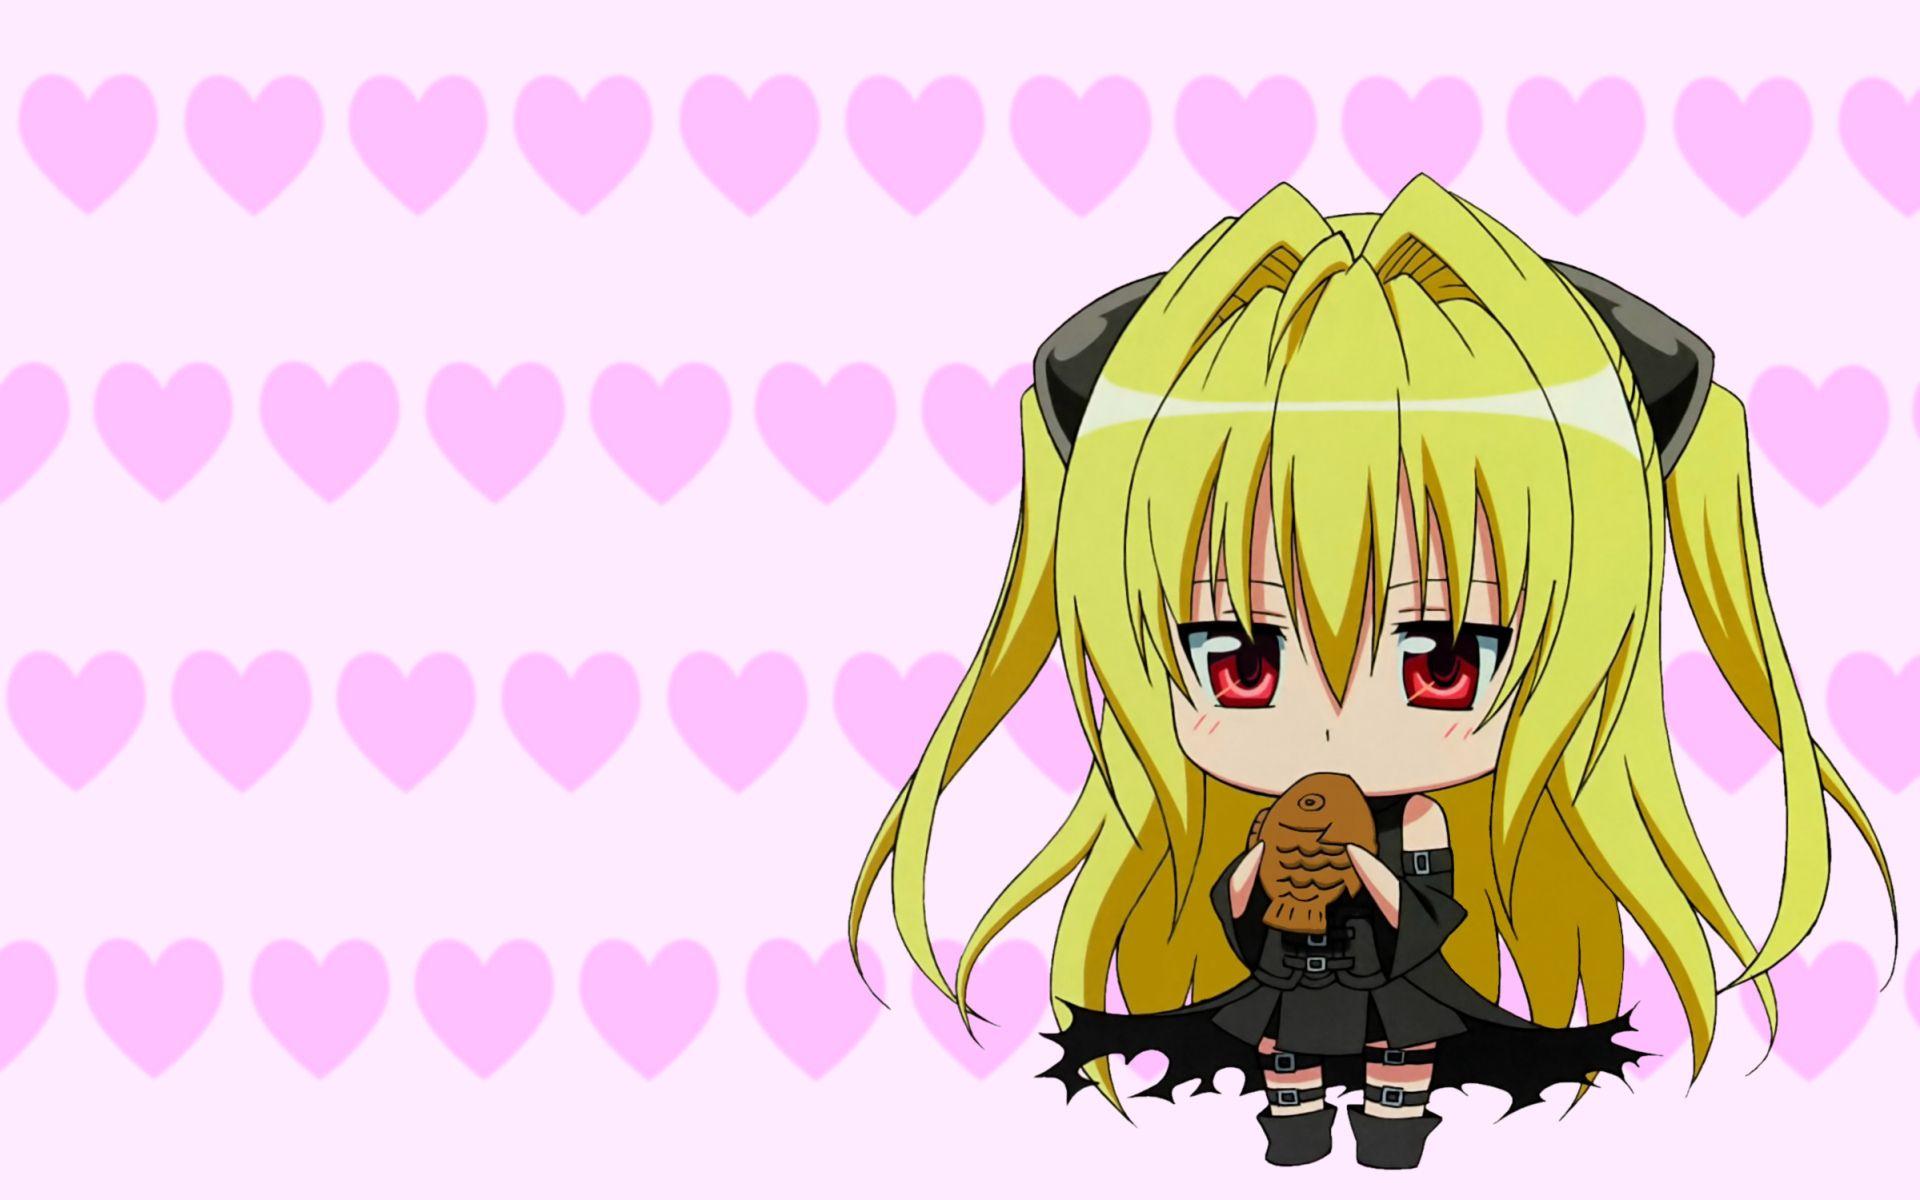 Anime To Love Ru Golden Darkness Chibi Wallpaper Anime In 2019